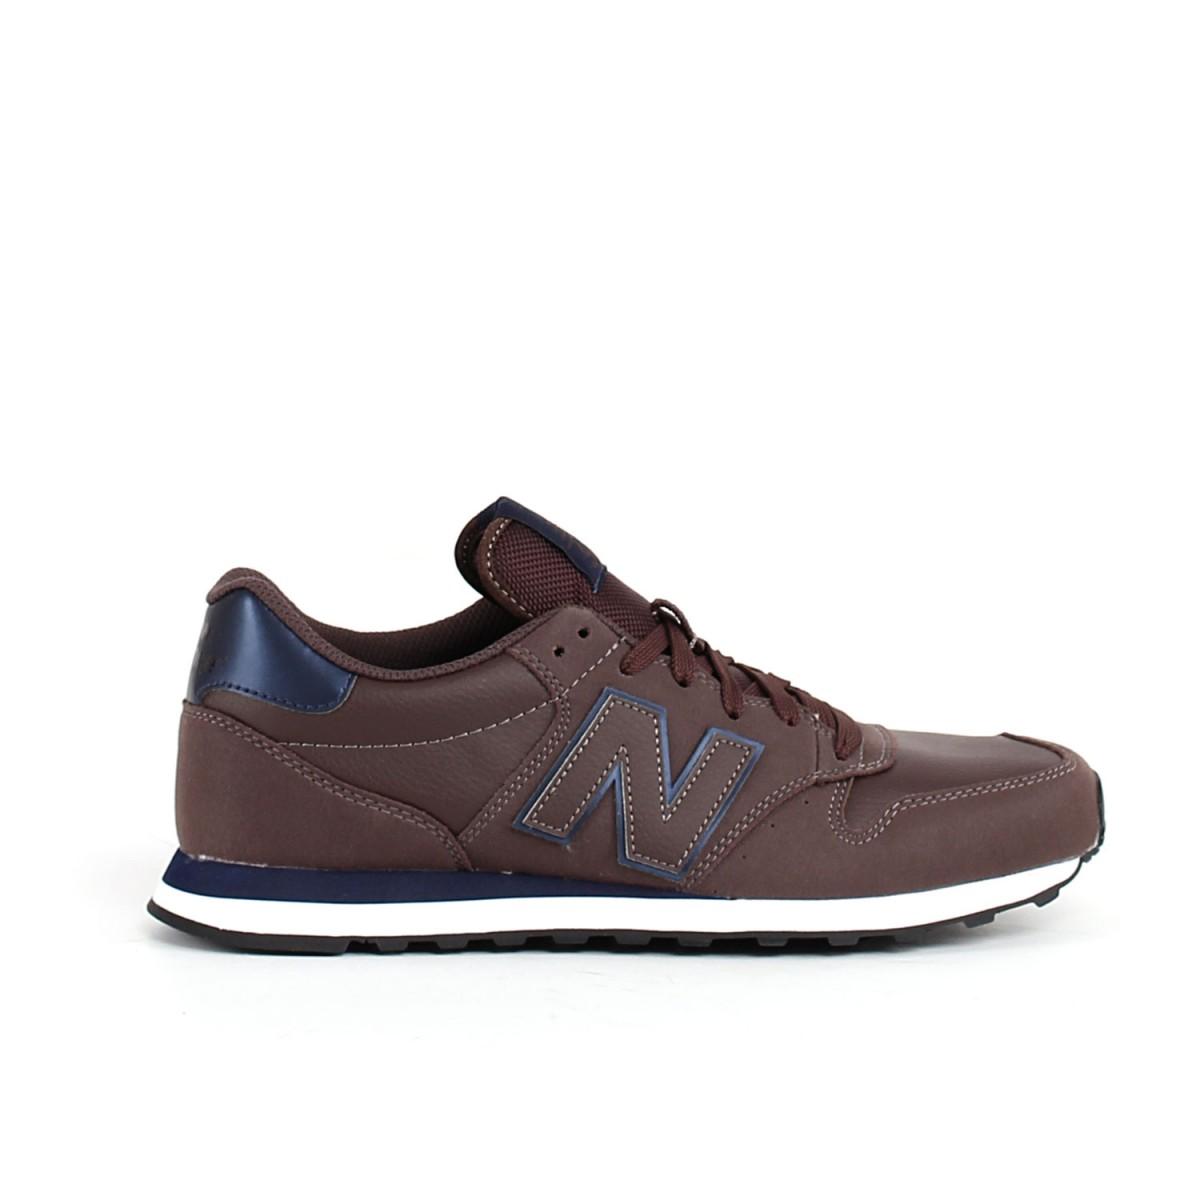 Sneakers New balance Uomo Gm500dbn Dark brown